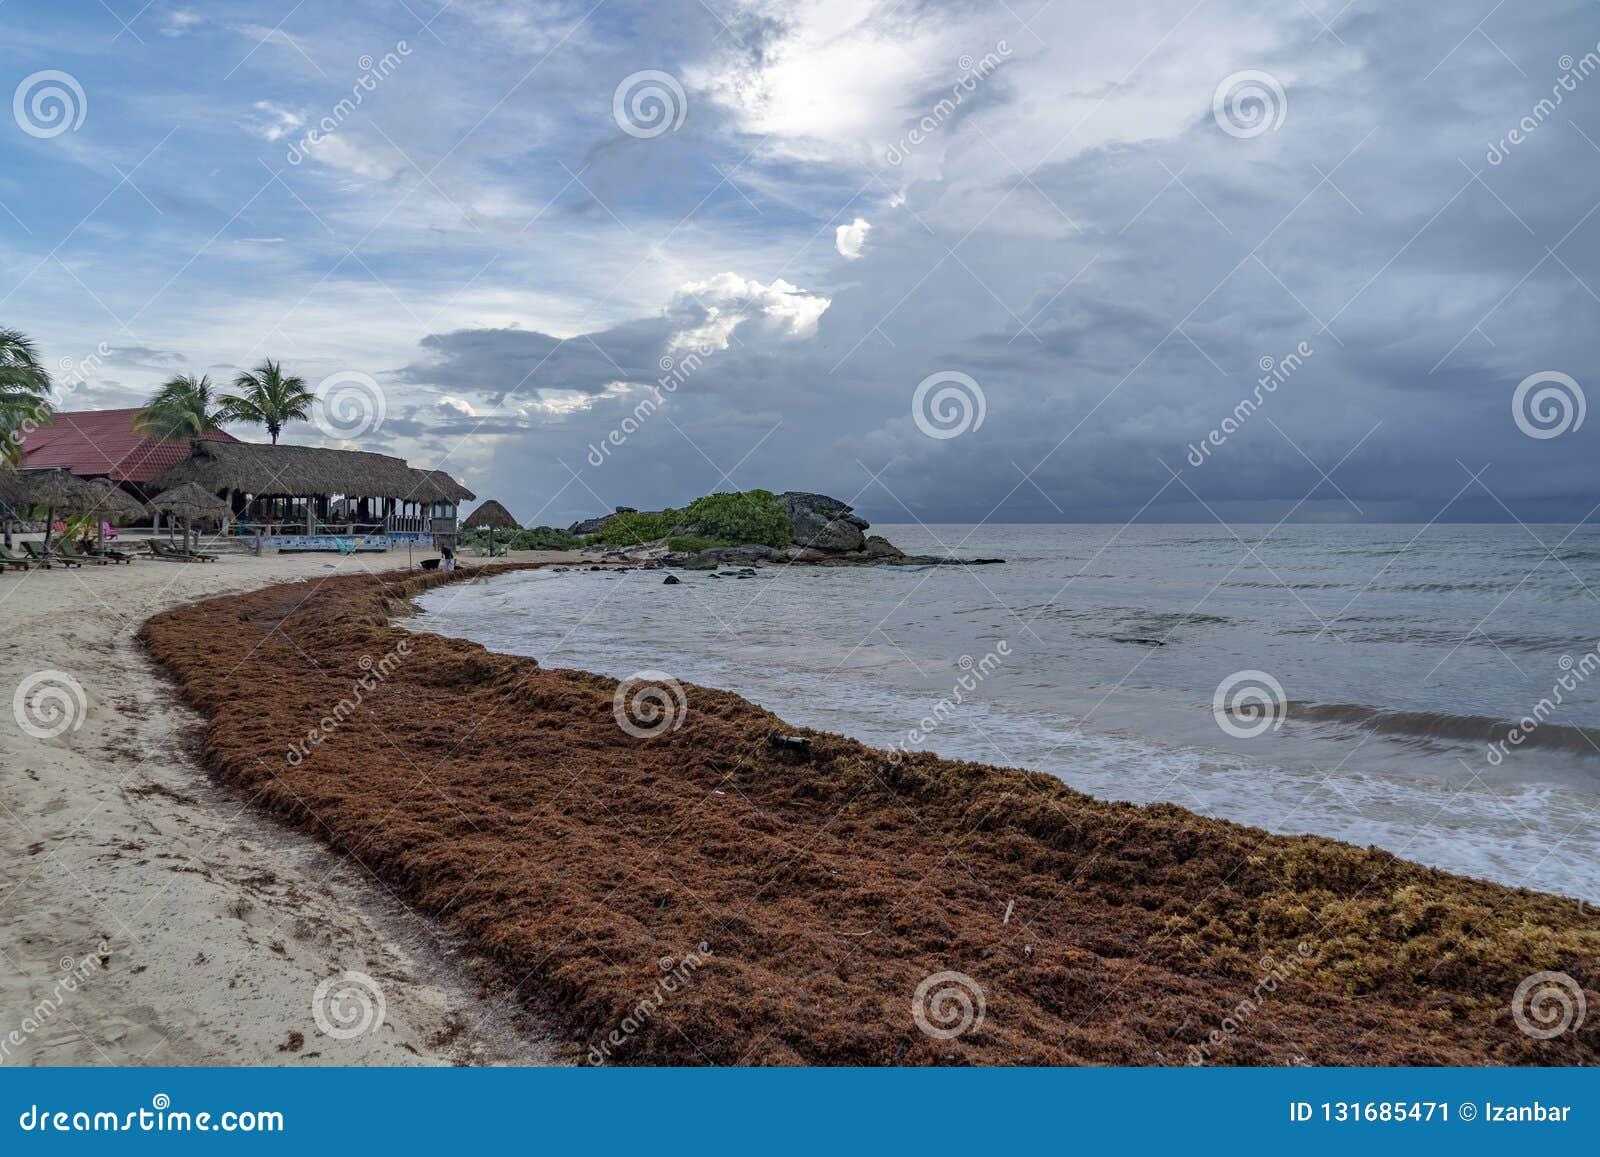 Caribbean Sandy Beach Covered By Sargasso Algae Seaweed In